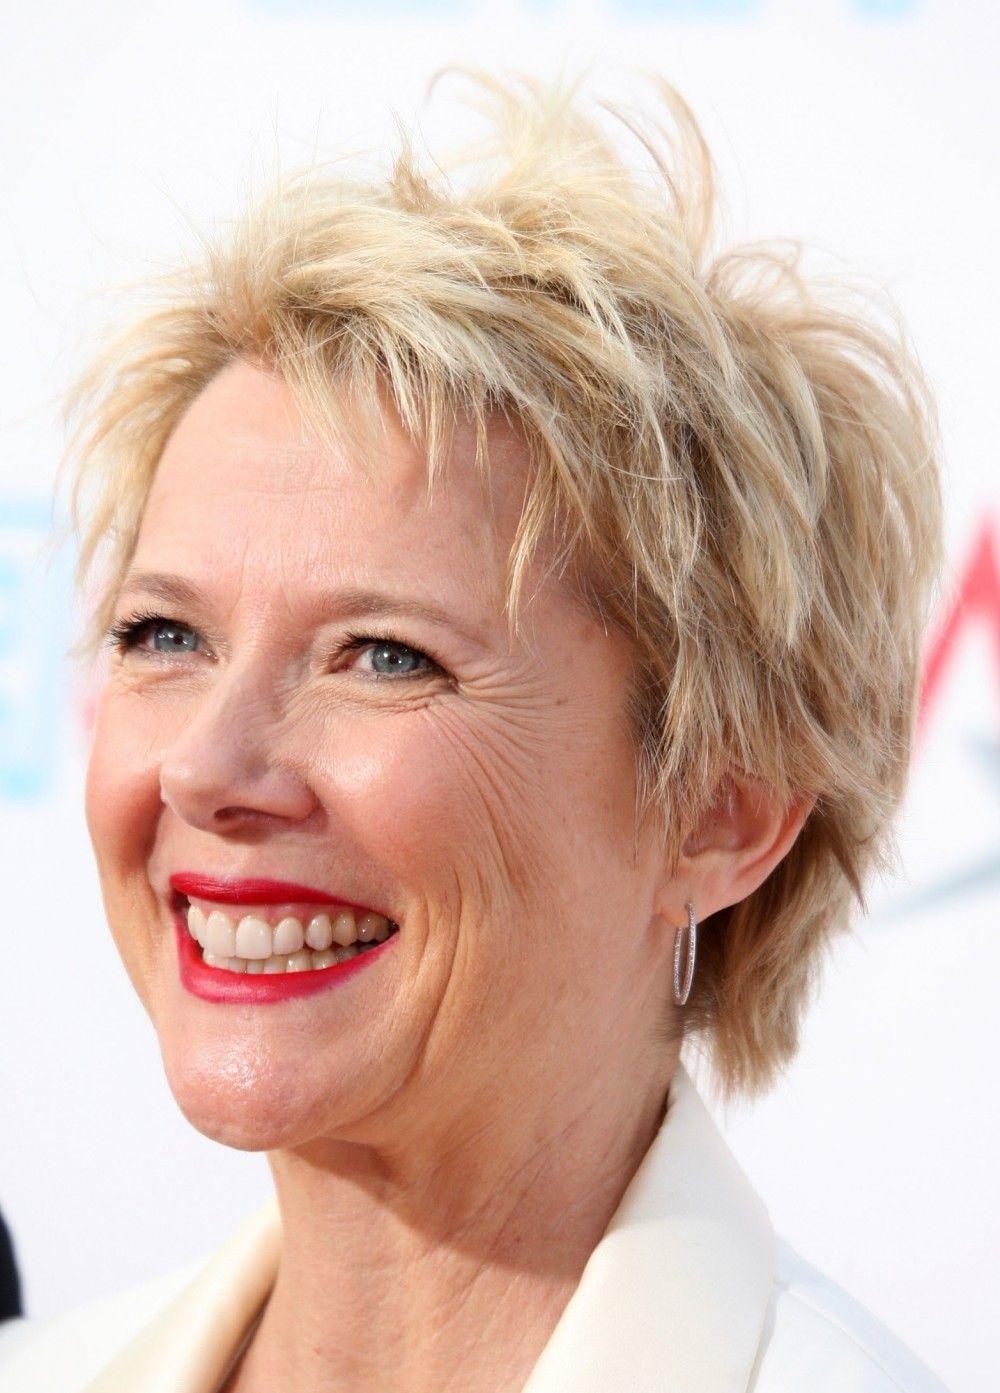 Image Result For Pixie Haircuts For Over 60 Korte Kapsels Rond Gezicht Korte Kapsels Voor Vrouwen Vrouwen Korte Kapsels